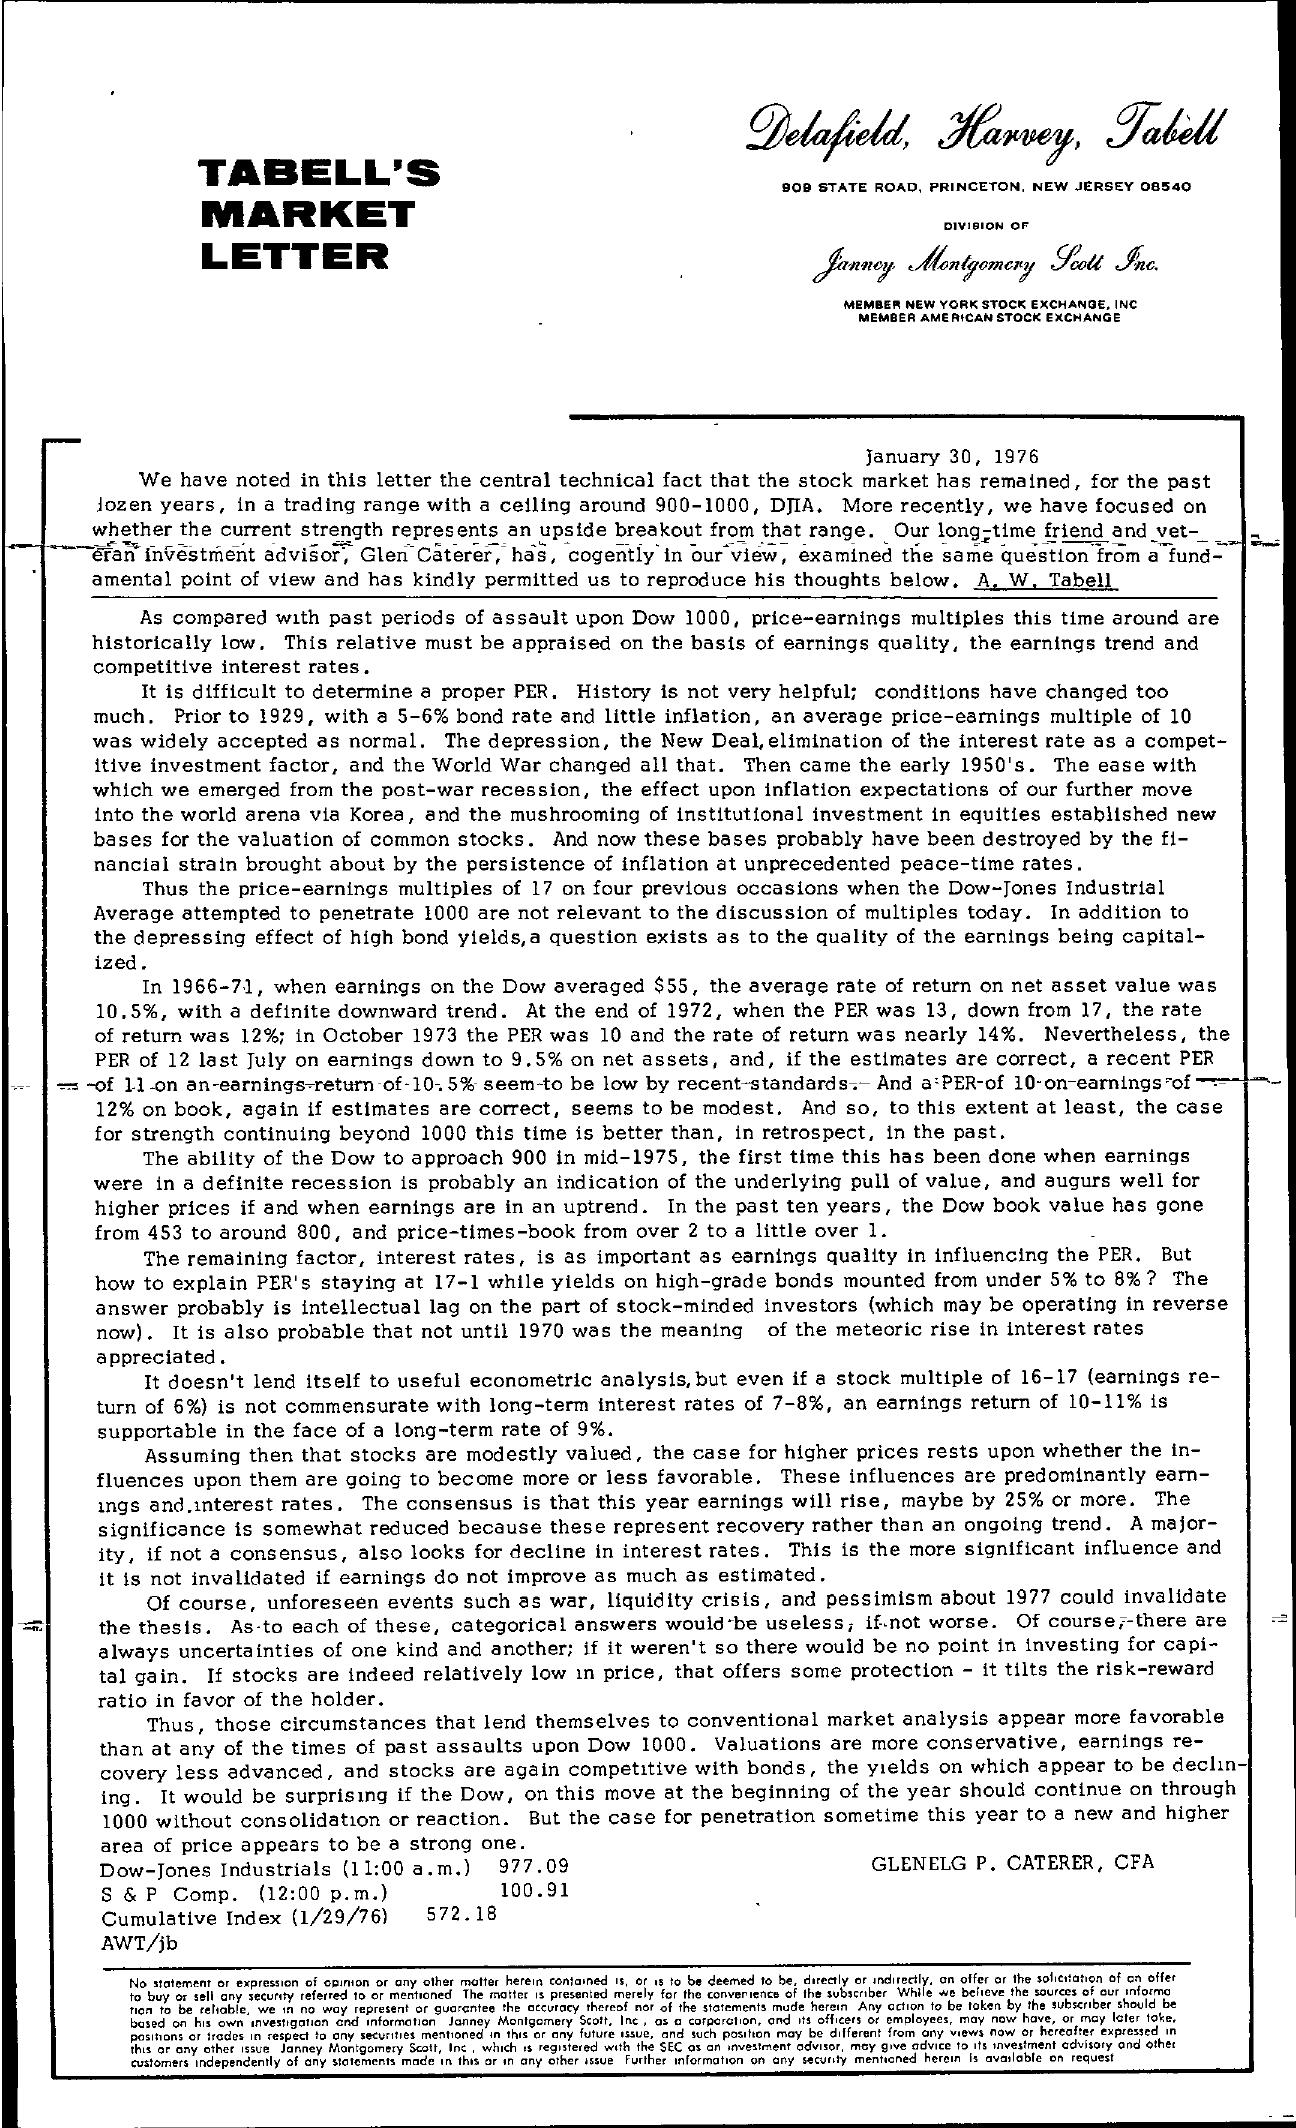 Tabell's Market Letter - January 30, 1976